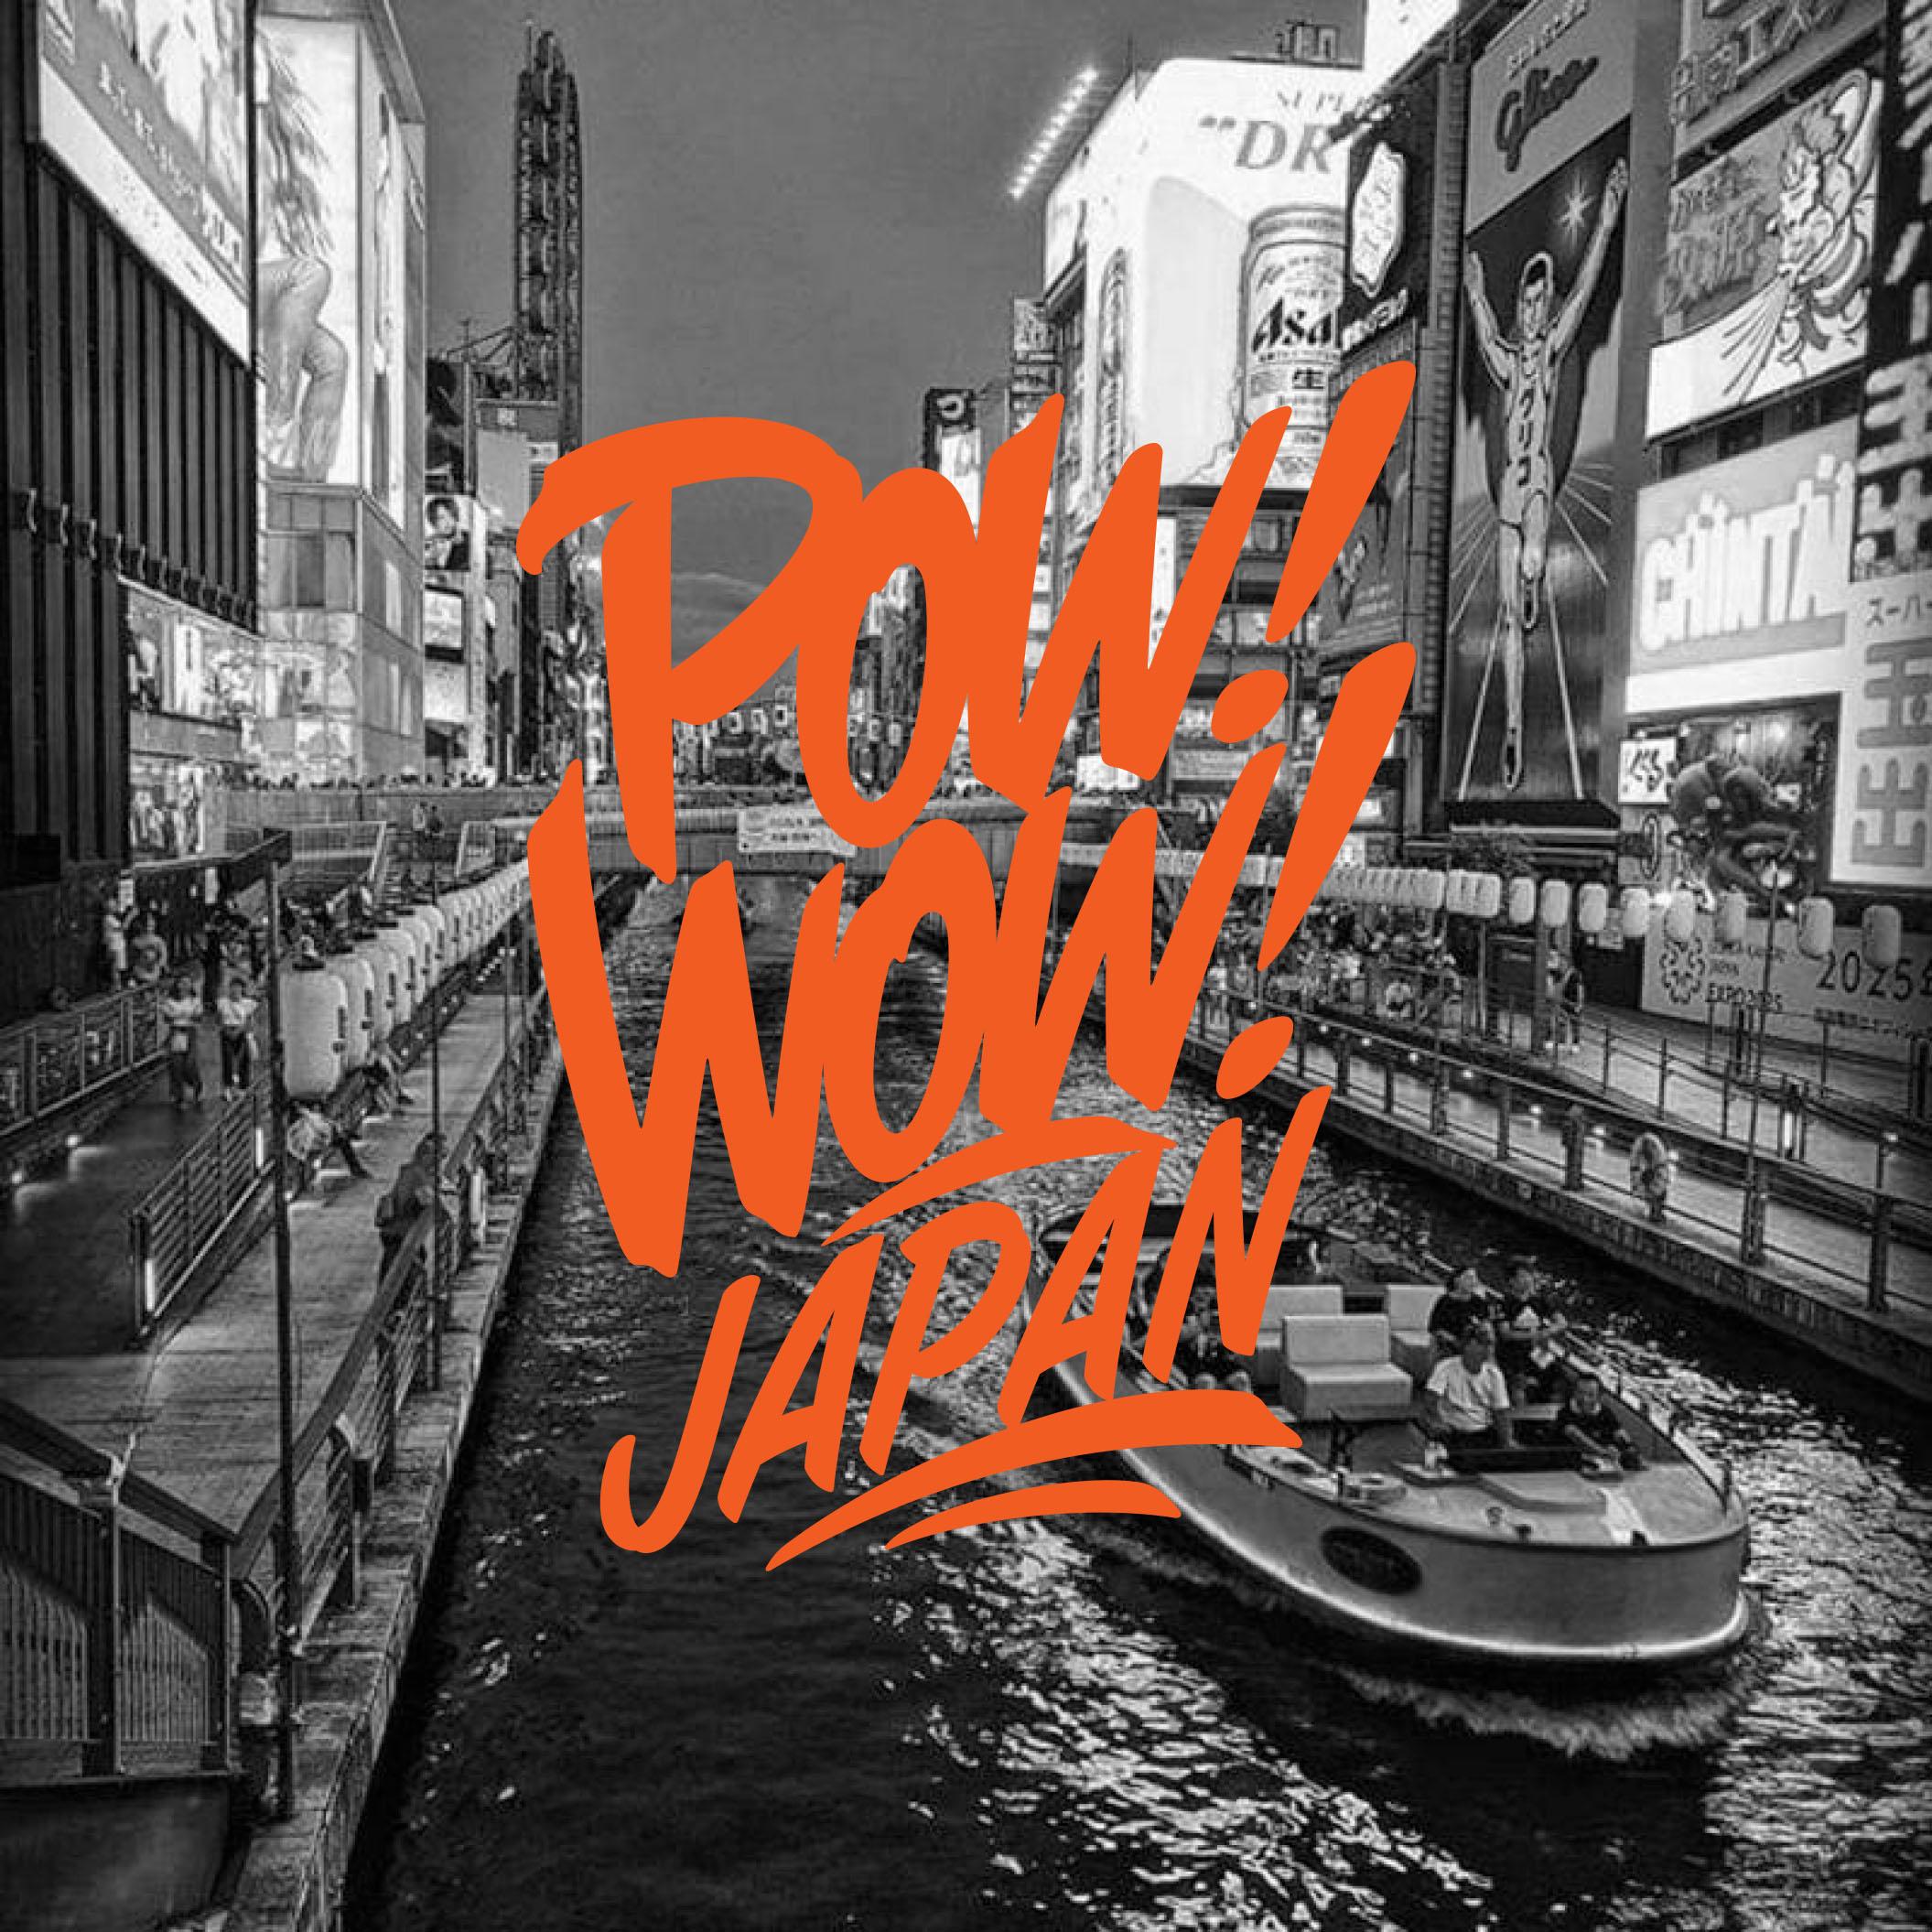 POW! WOW! JAPAN